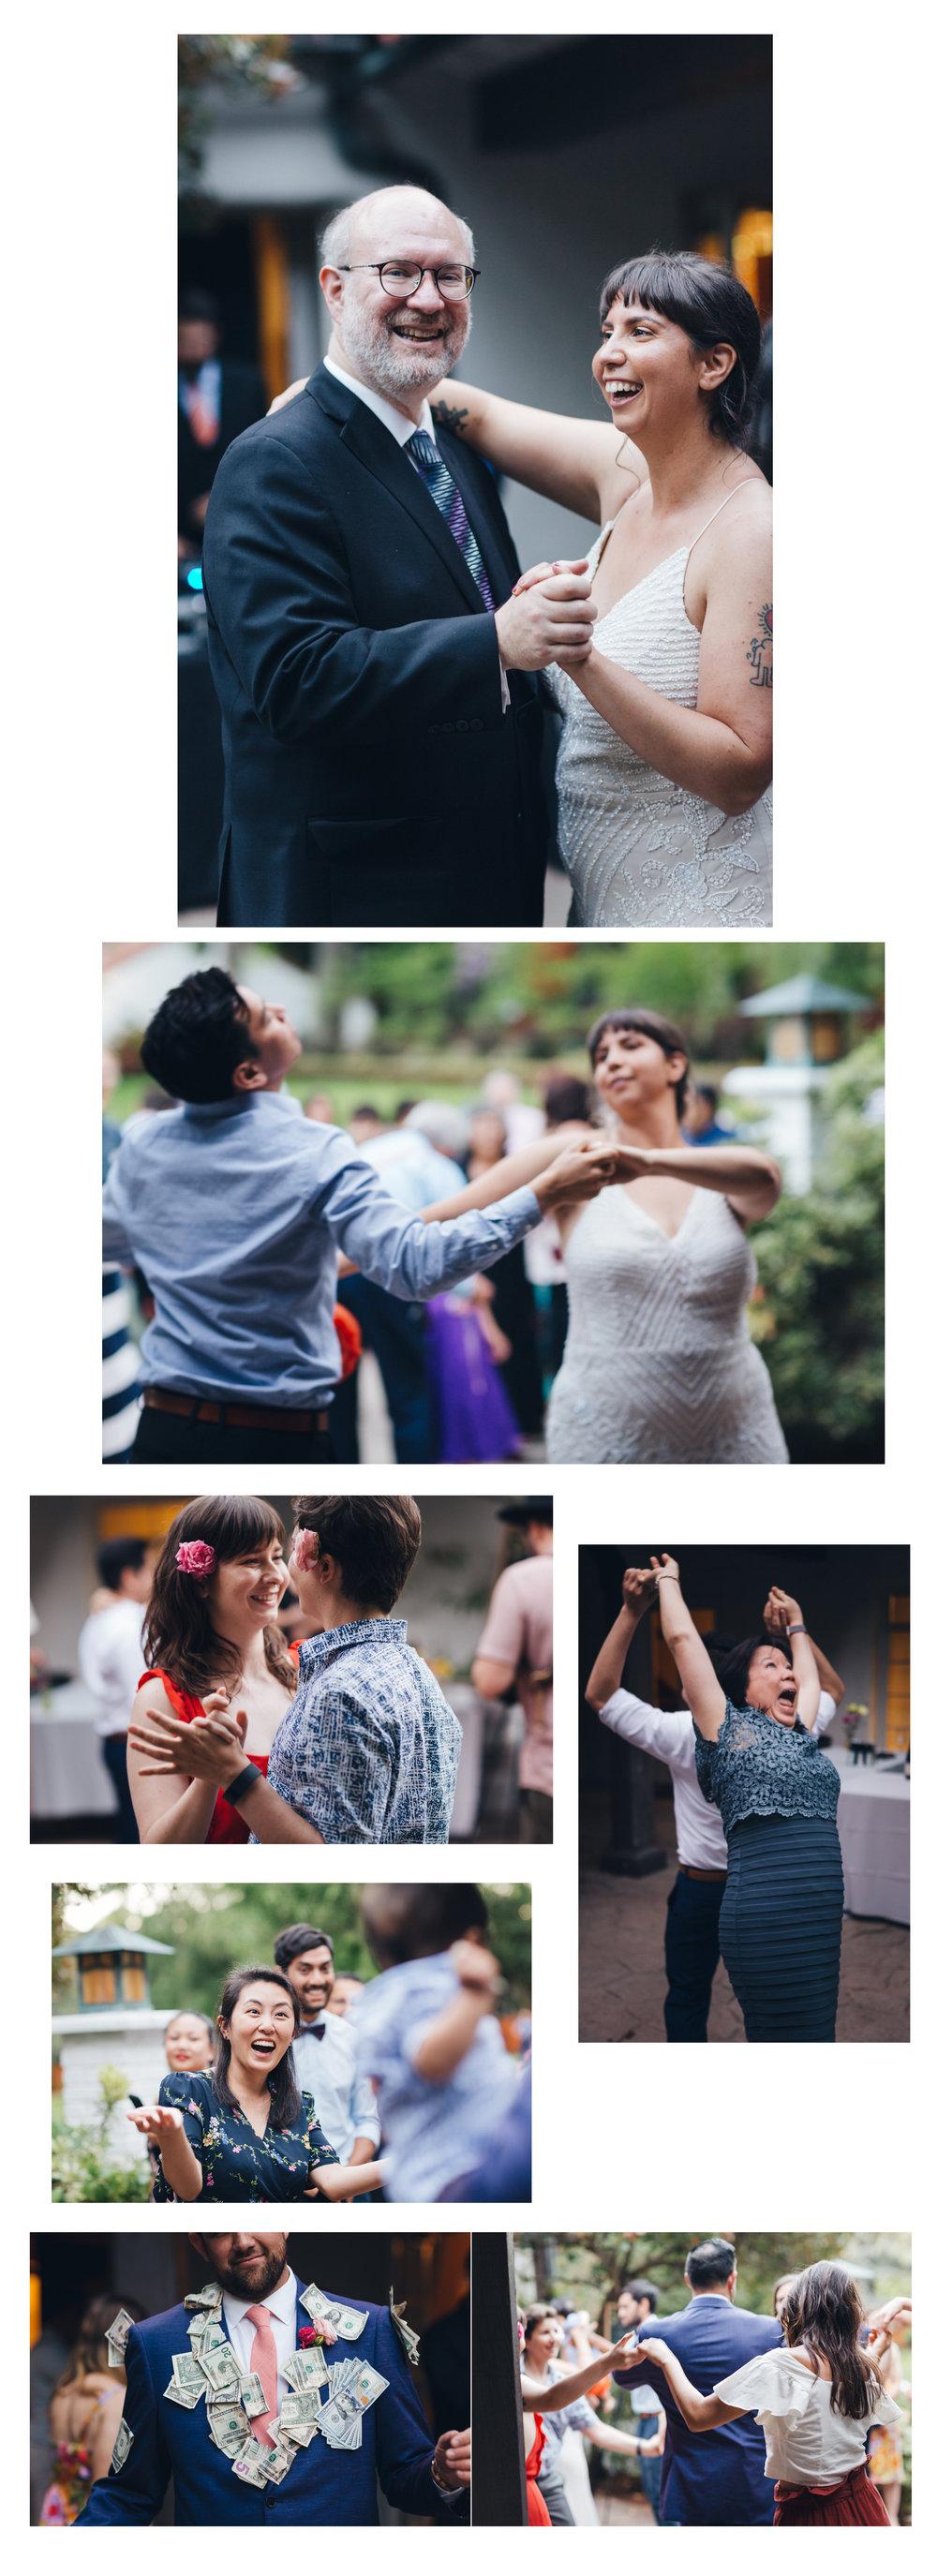 IG_wedding (75 of 110) copy.jpg